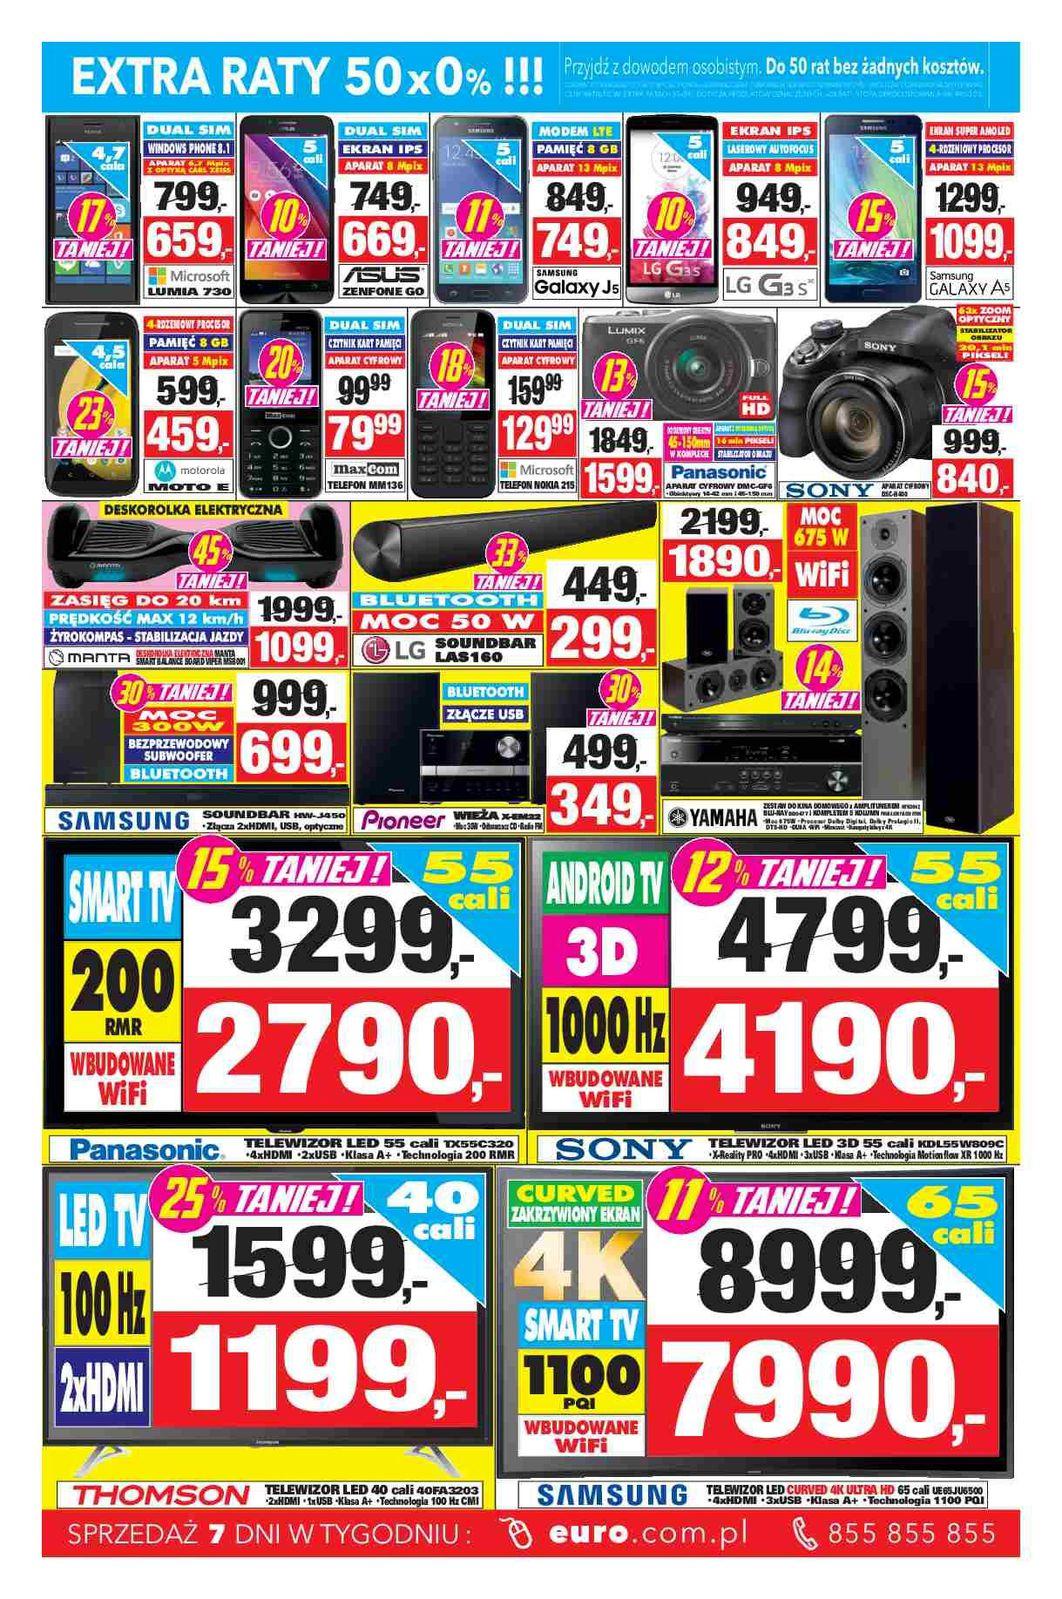 Gazetka promocyjna RTV Euro AGD do 31/12/2015 str.2